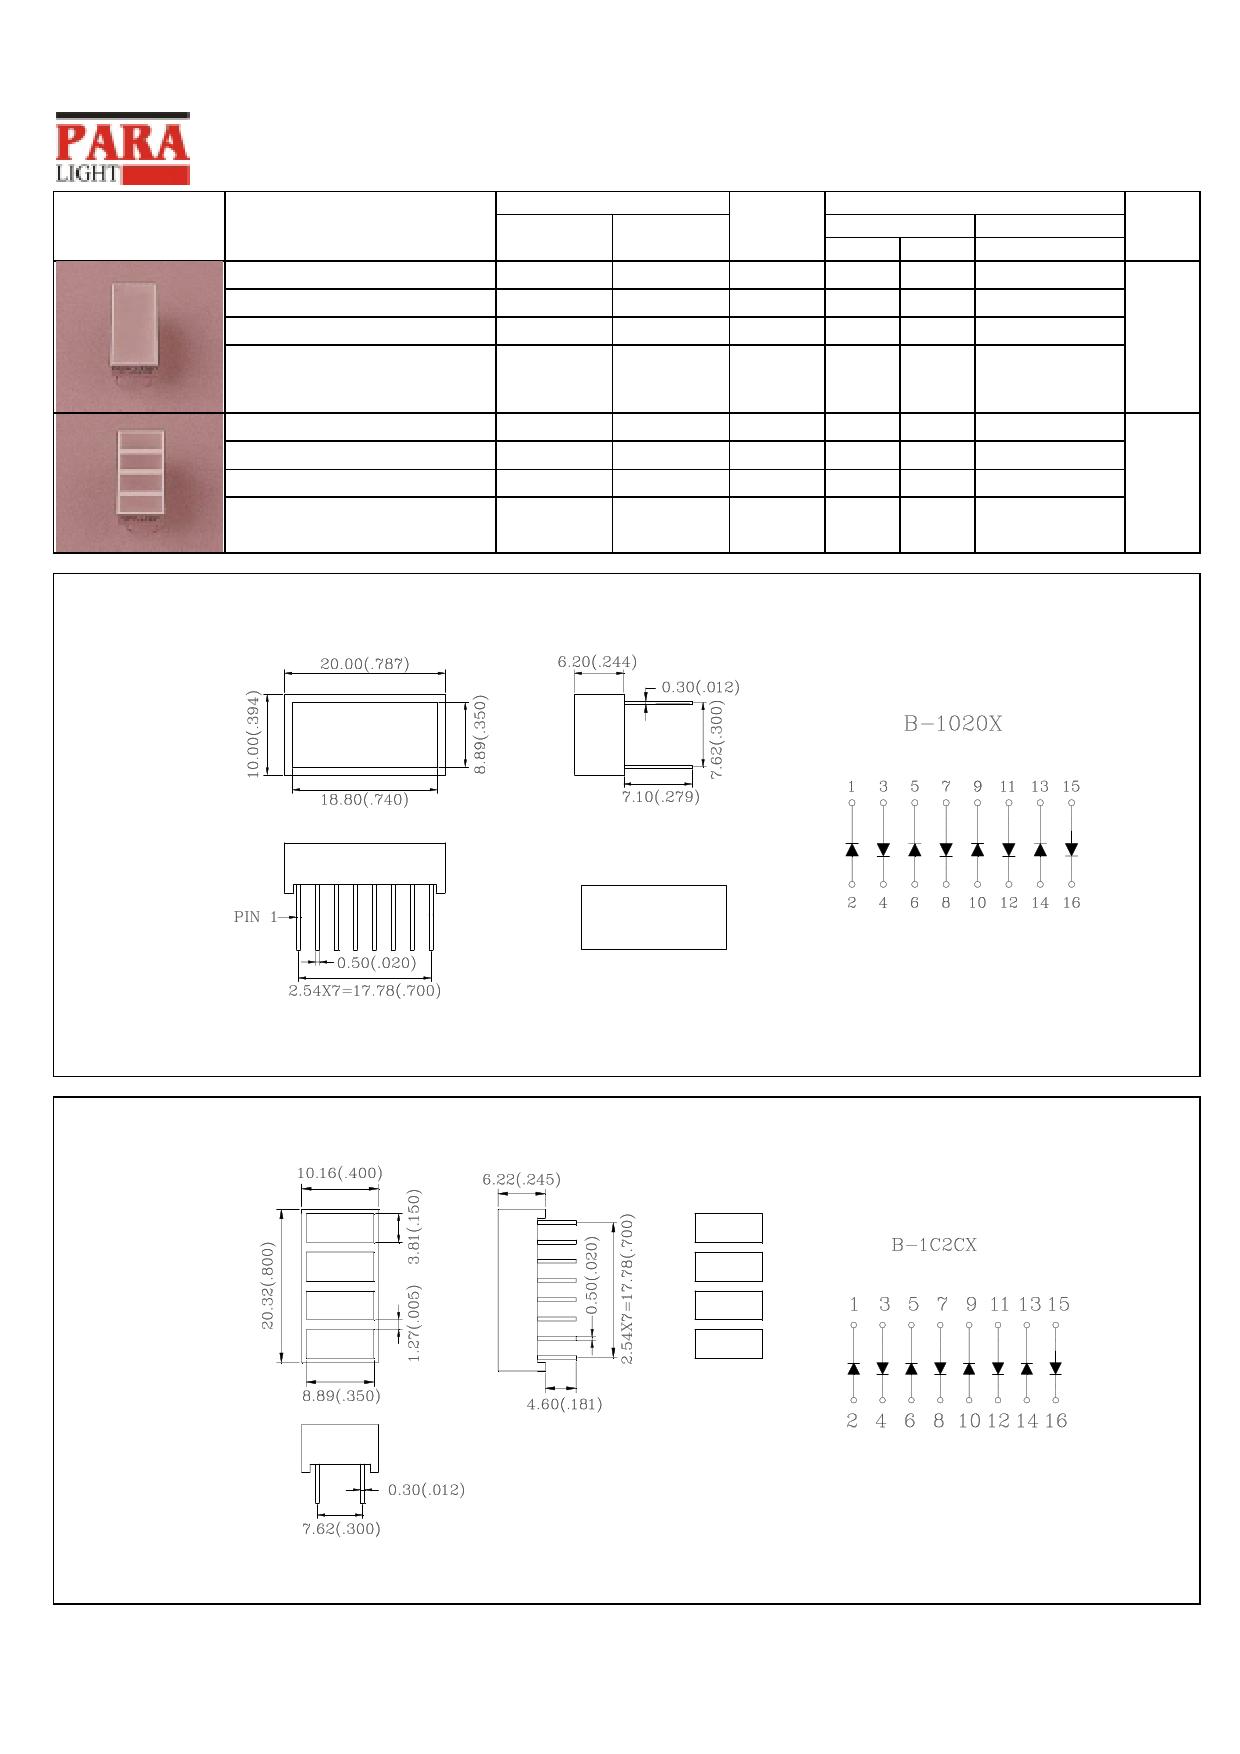 B-1C2CX даташит PDF